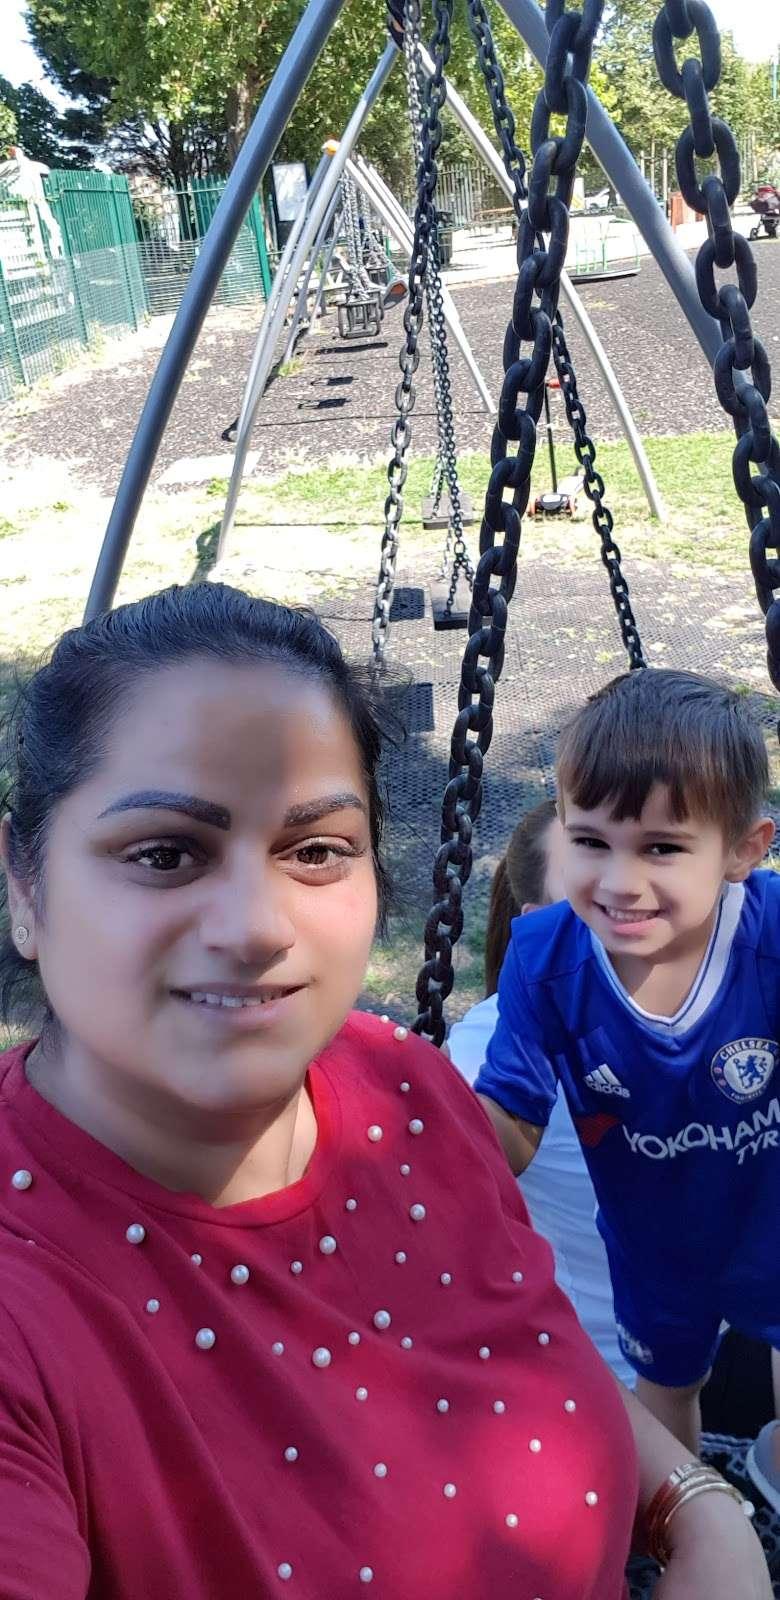 Cricklewood Playground - park    Photo 5 of 6   Address: Kara Way, London NW2 6QN, UK   Phone: 020 8359 4000